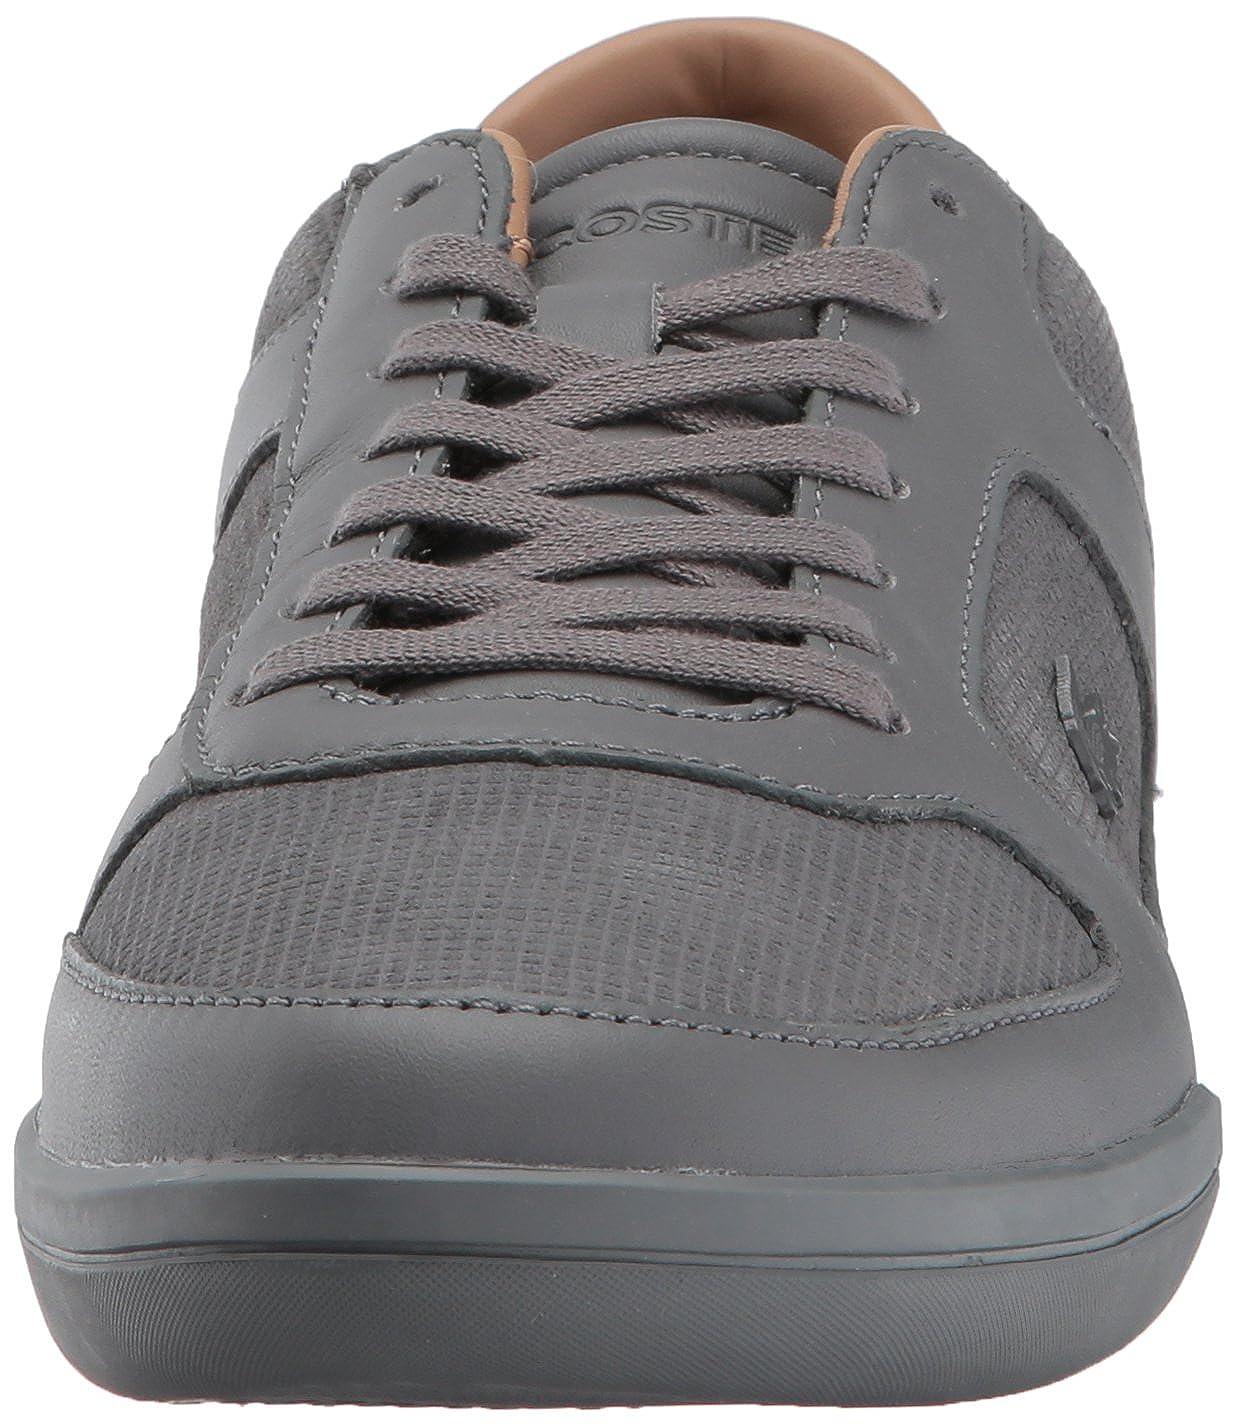 Amazon.com | Lacoste Mens Court-Minimal 317 1 Sneaker | Fashion Sneakers